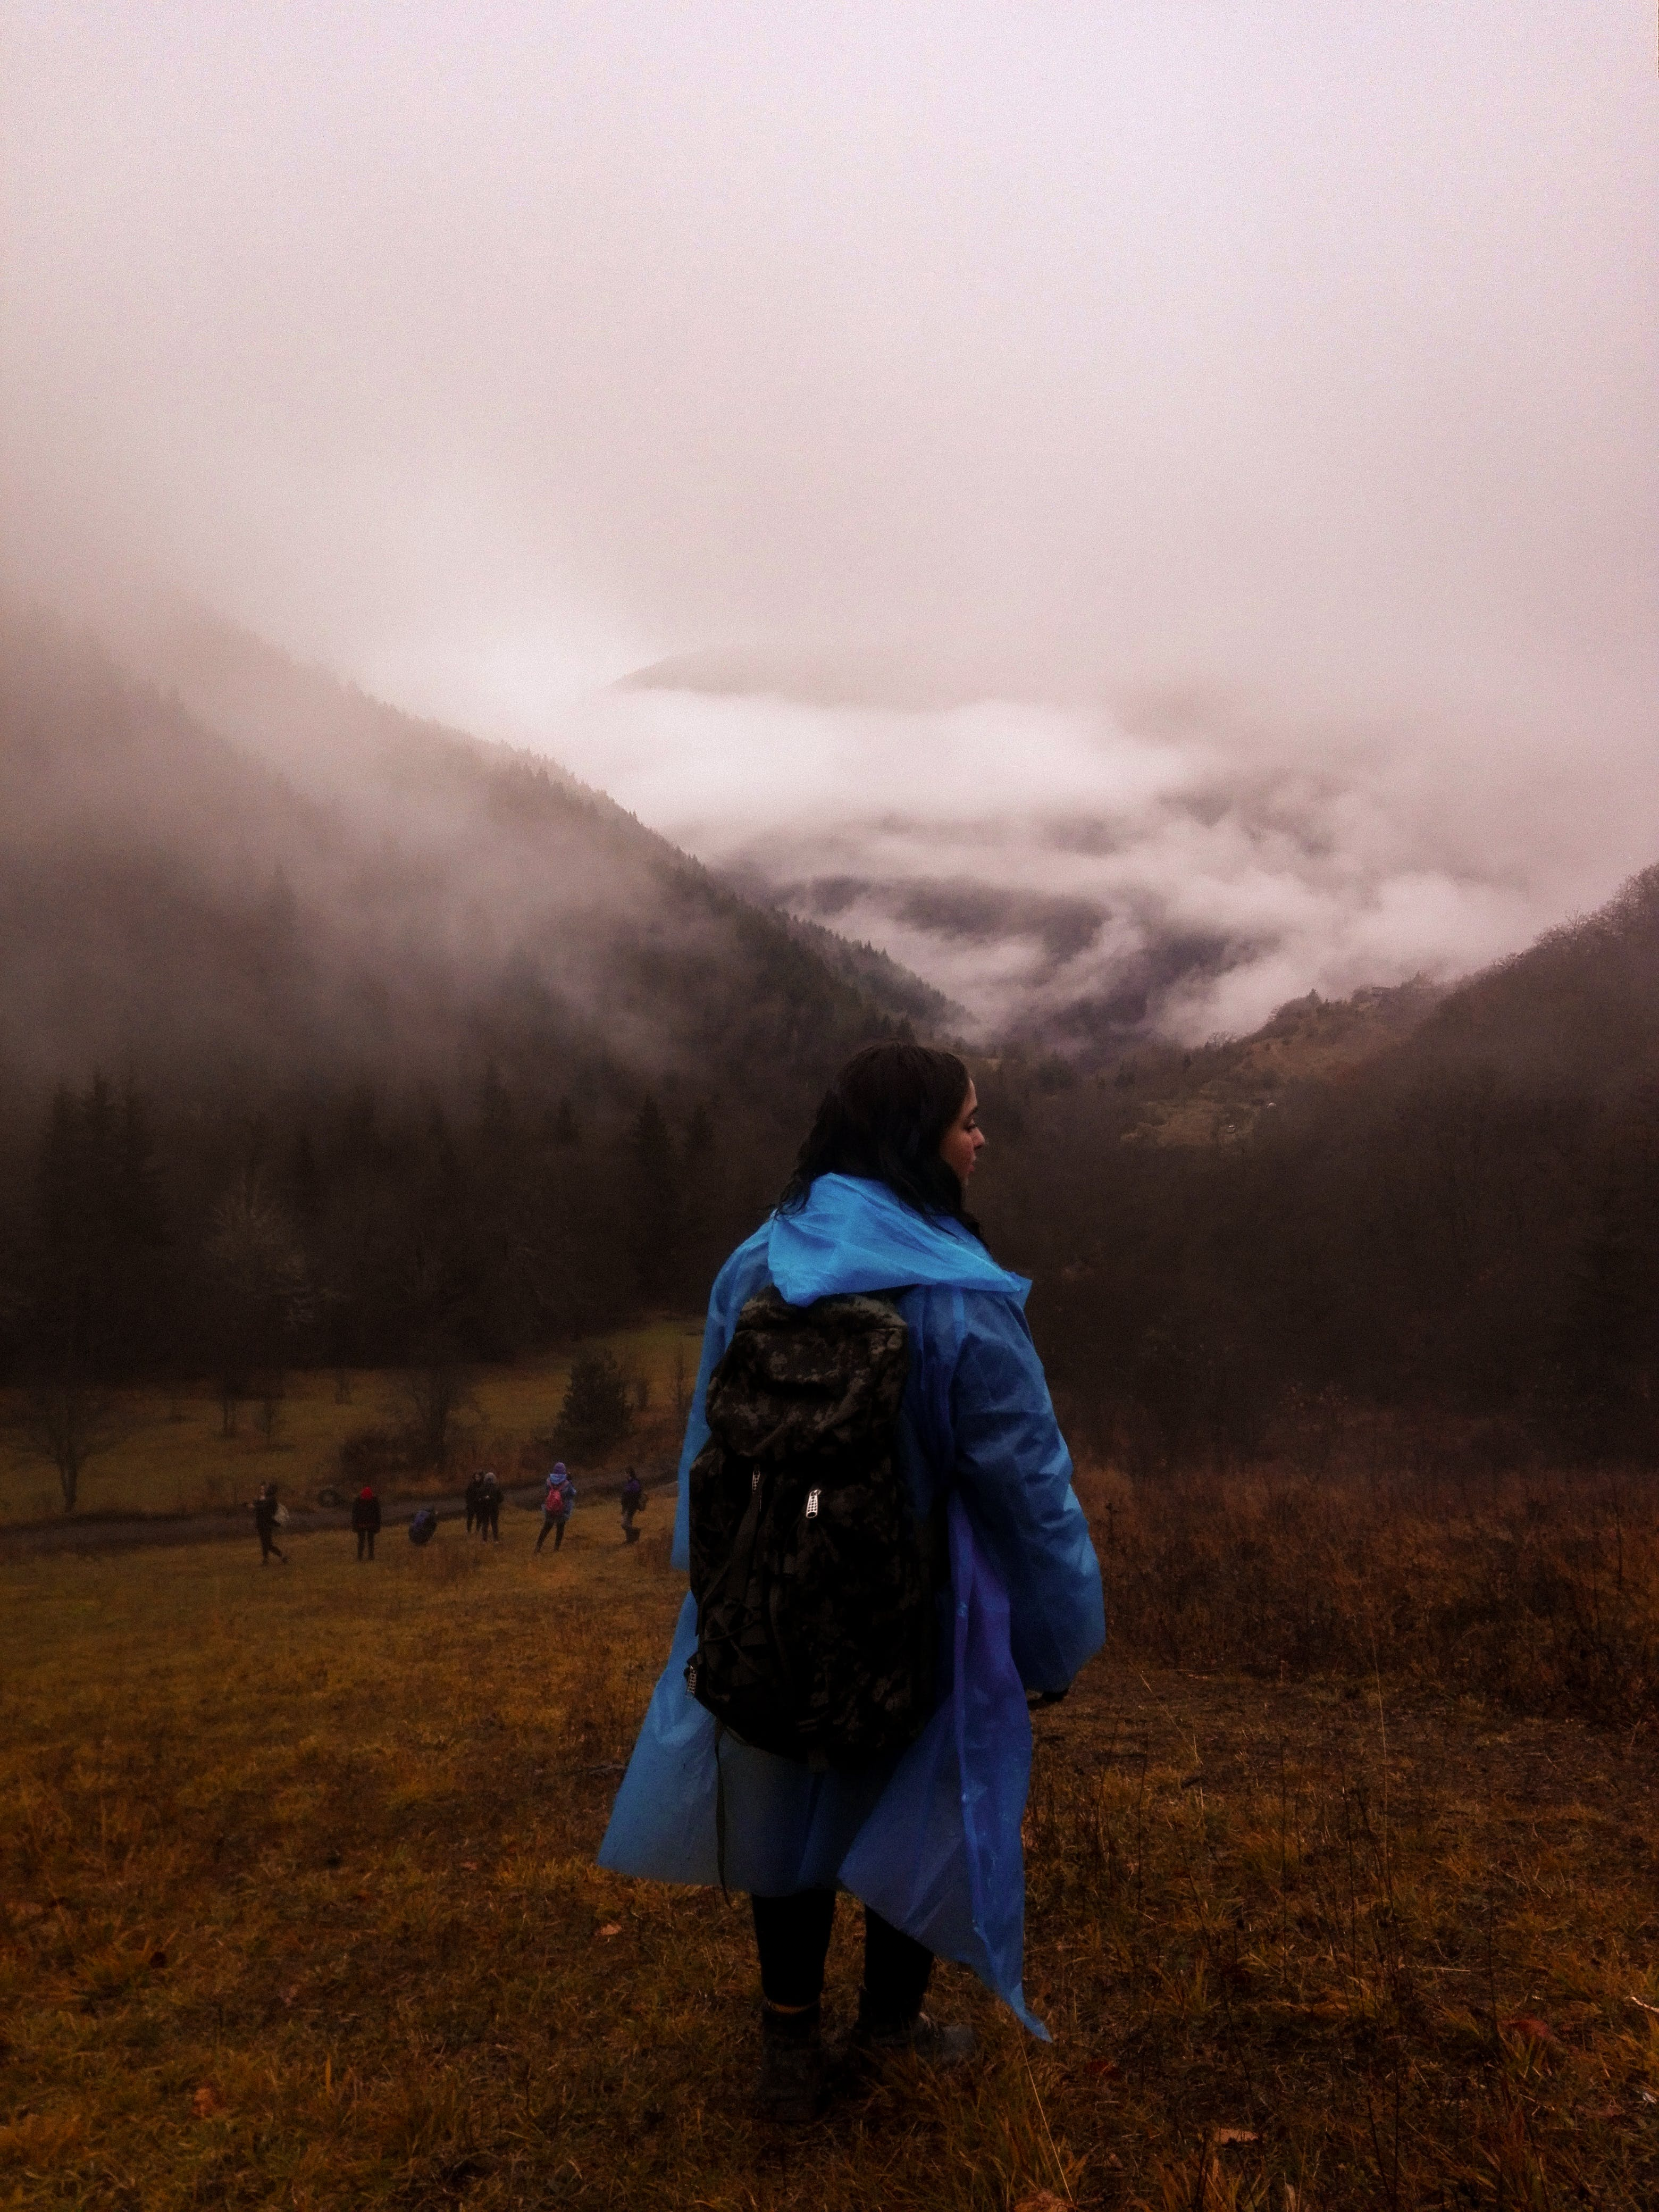 Kostenloses Stock Foto zu frau, nebel, neblig, person